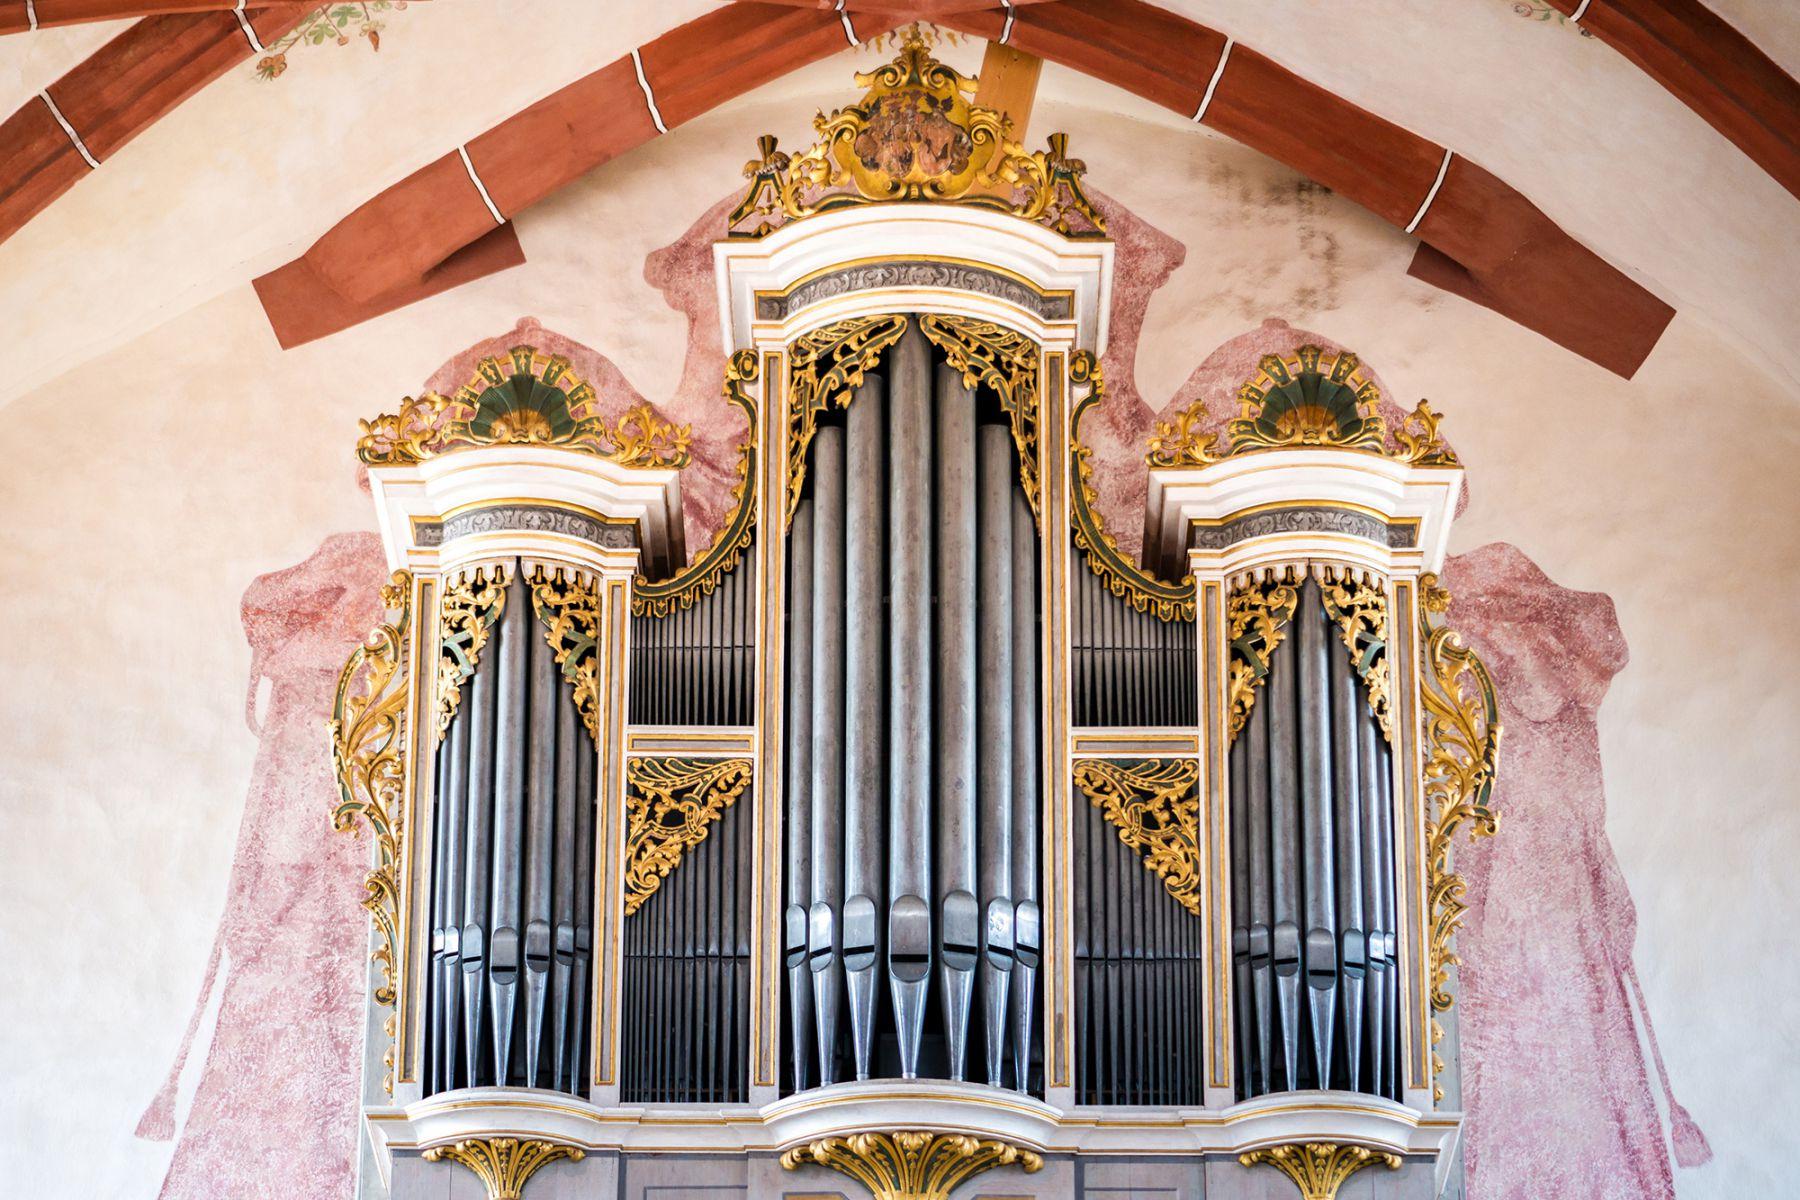 Foto van het Silbermann-Orgel in de St. Marienkirche in Rötha | Foto: Dr. Dieter Wadewitz